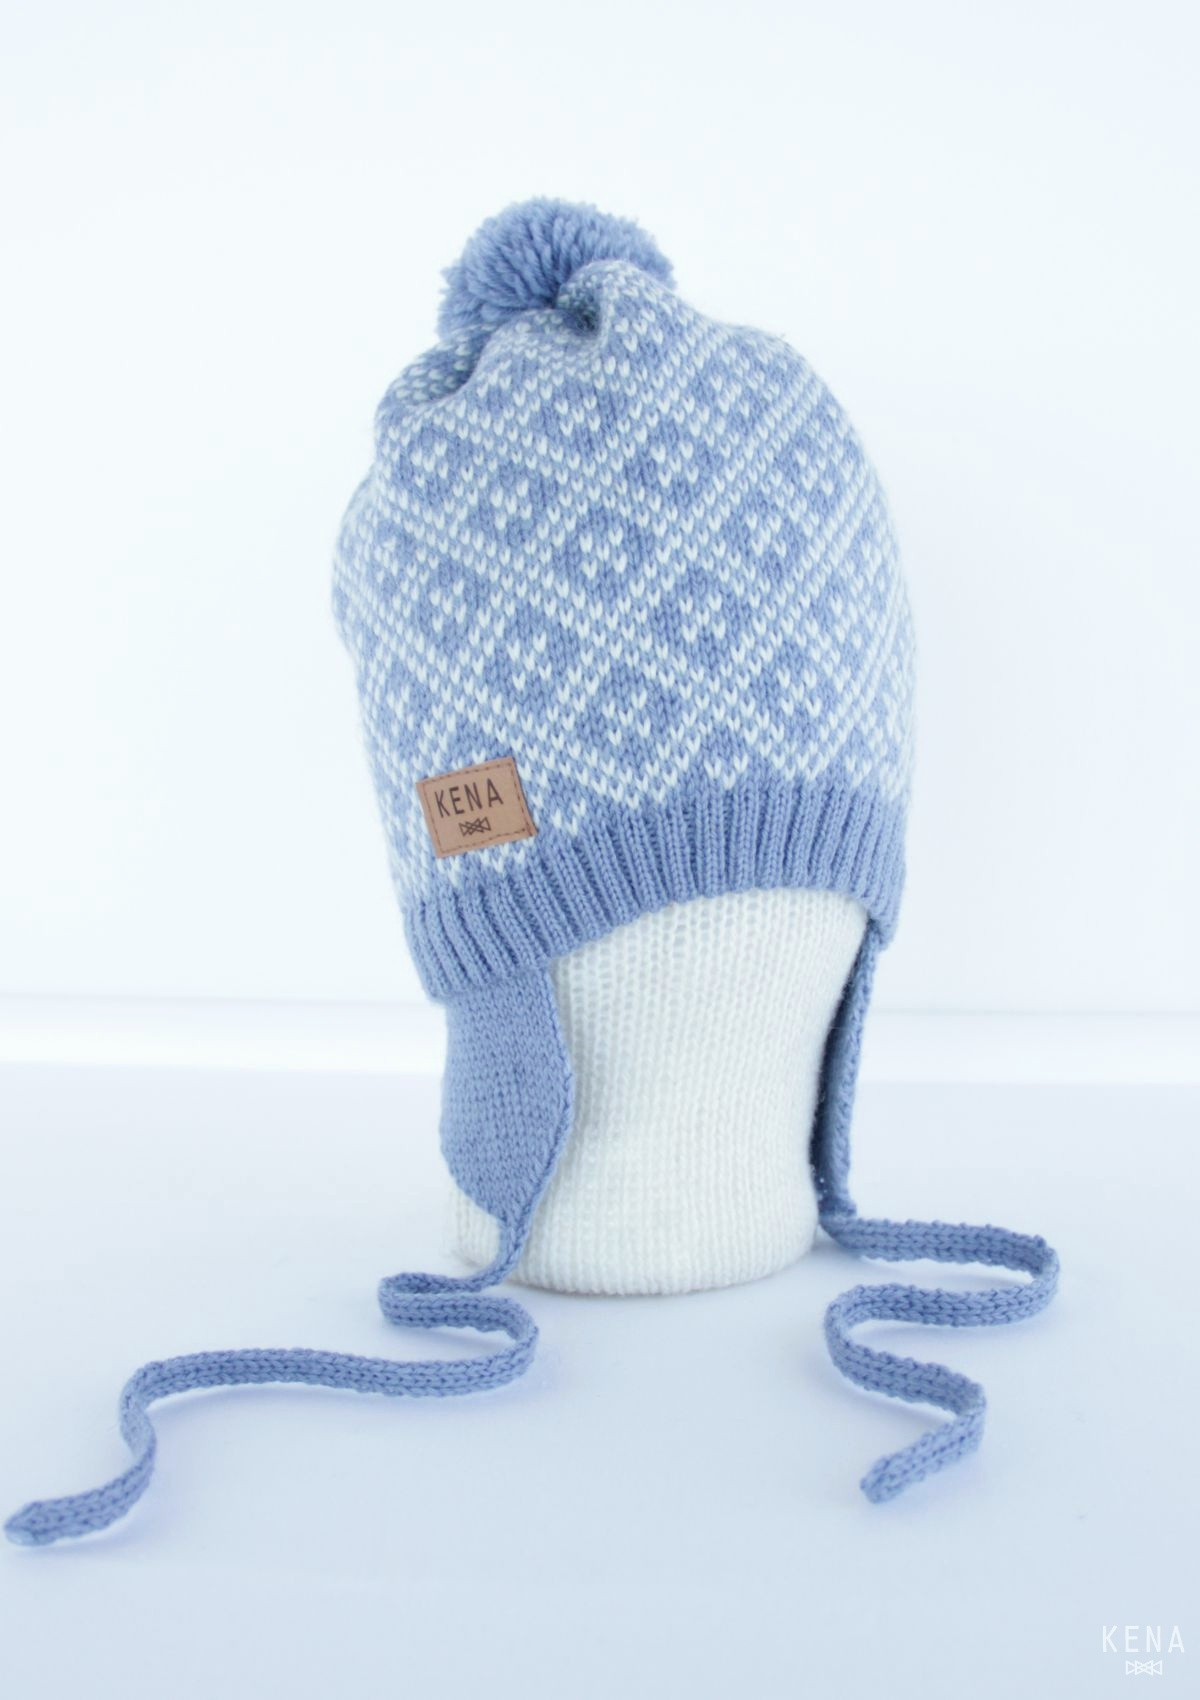 83a509143 Knitted pure merino wool pom pom earflap hat